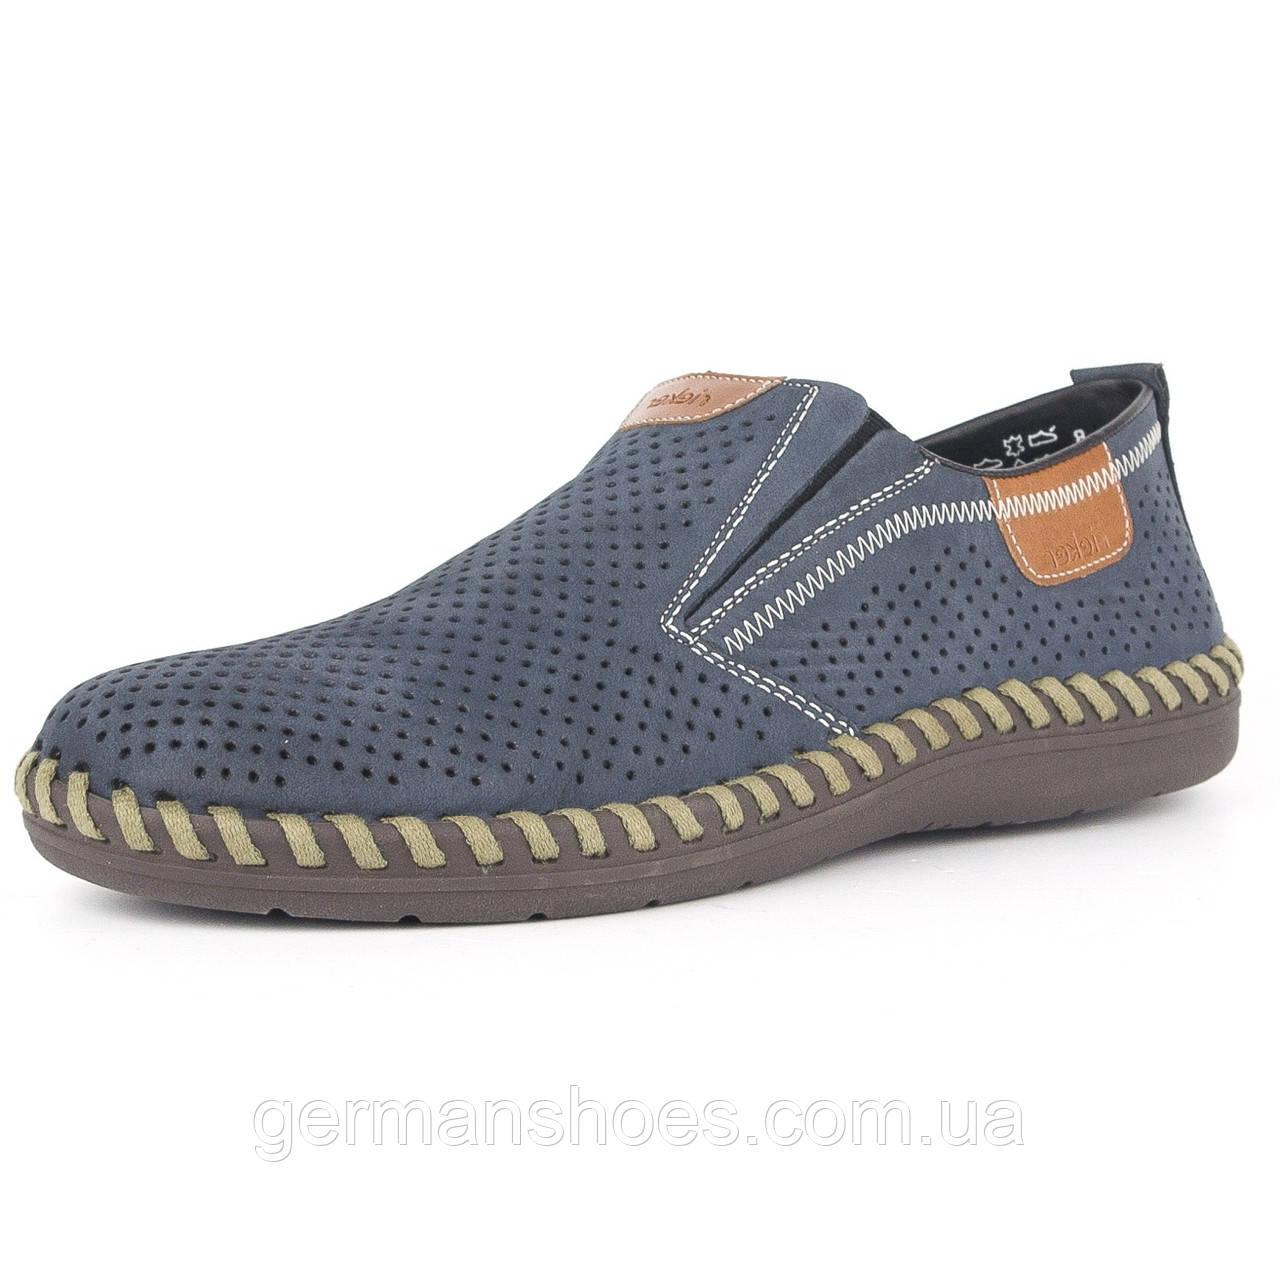 240b11452560 Туфли мужские Rieker B2465-14 - Интернет-магазин обуви